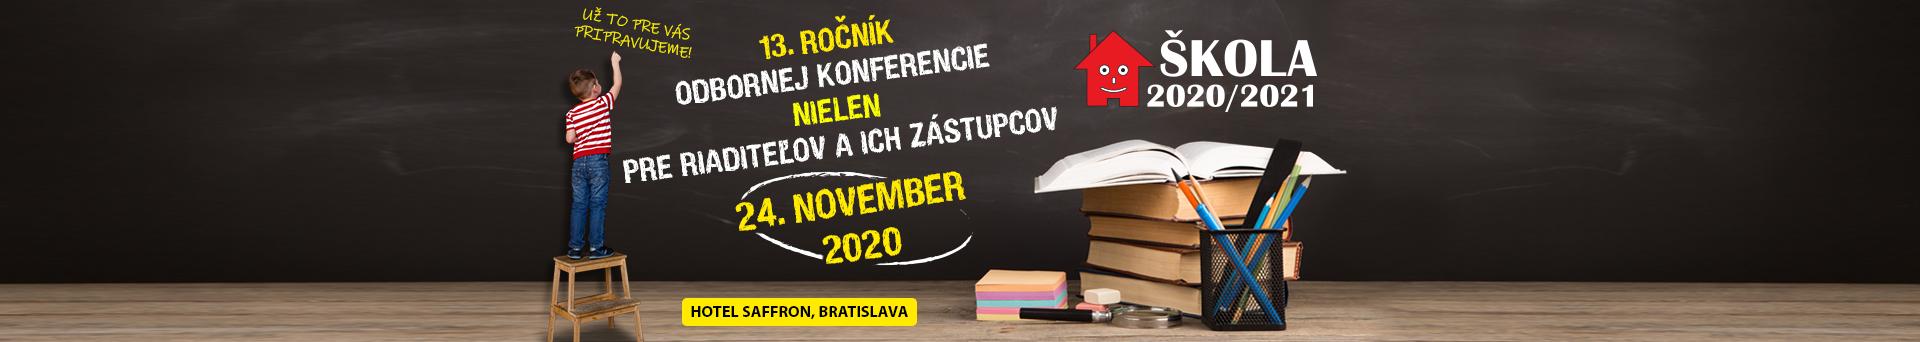 ŠKOLA 2020/2021